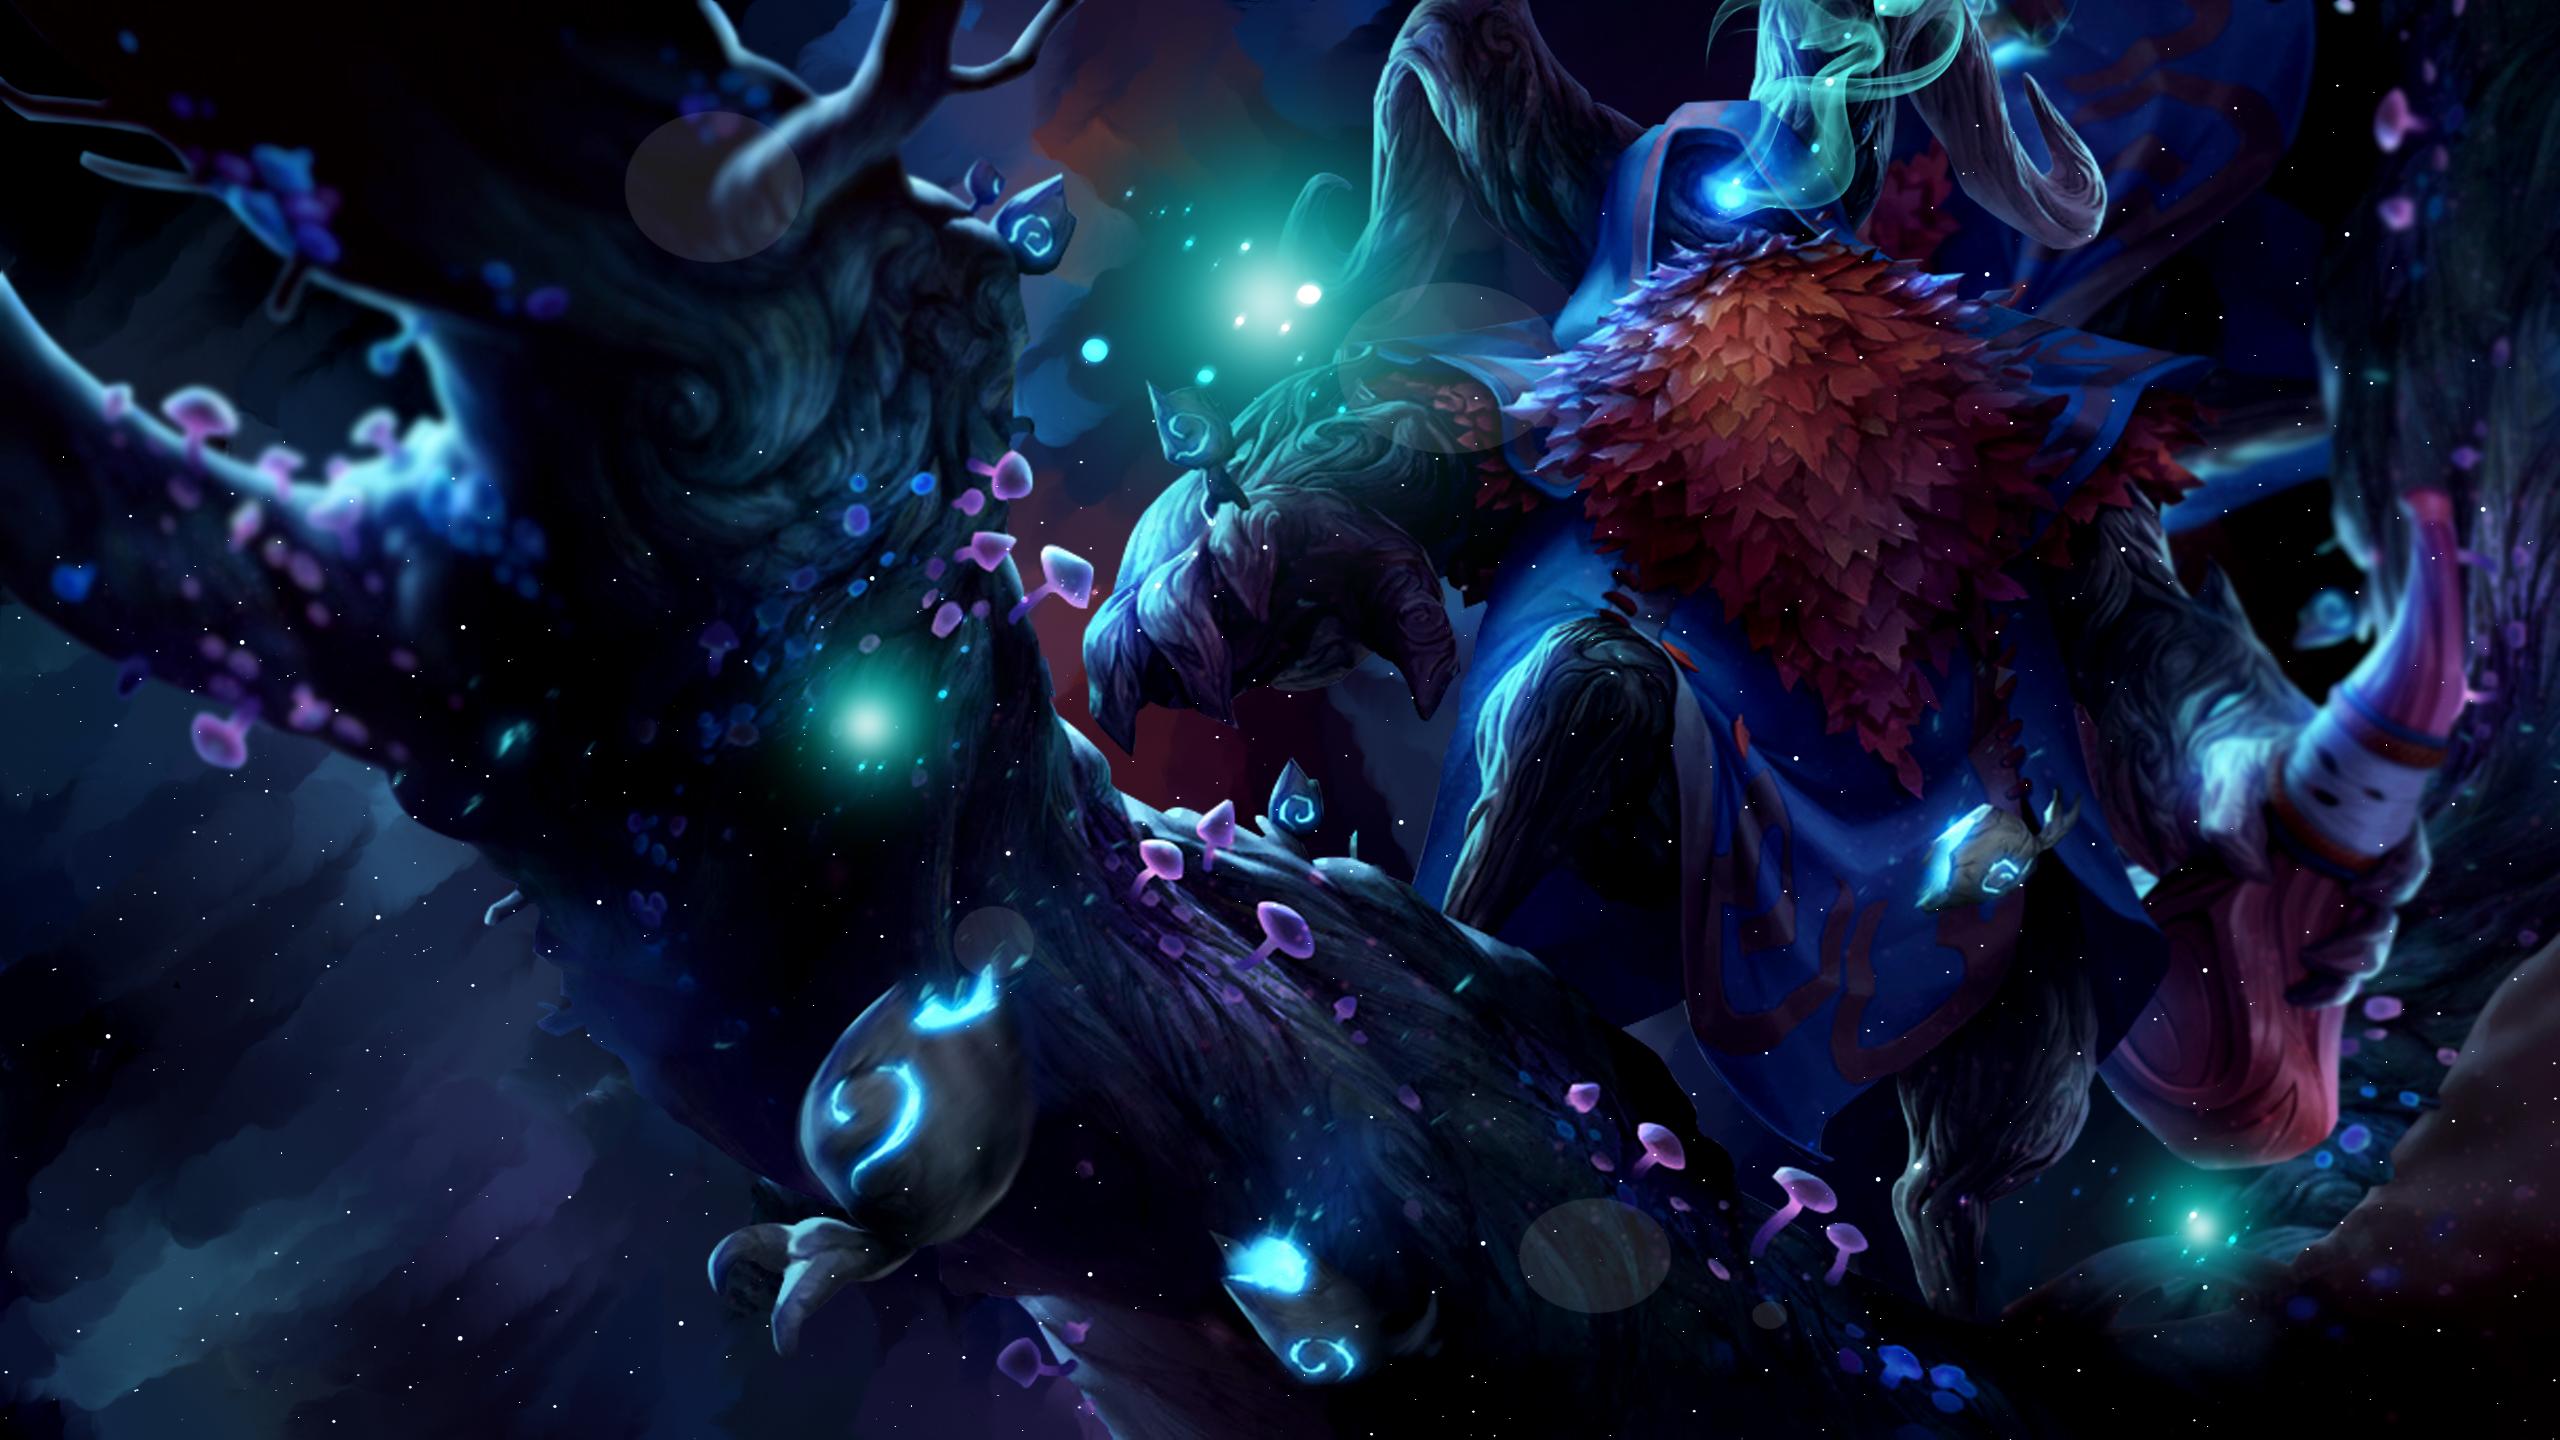 DeviantArt: More Like League of Legends - Bard Wallpaper by Soinnes